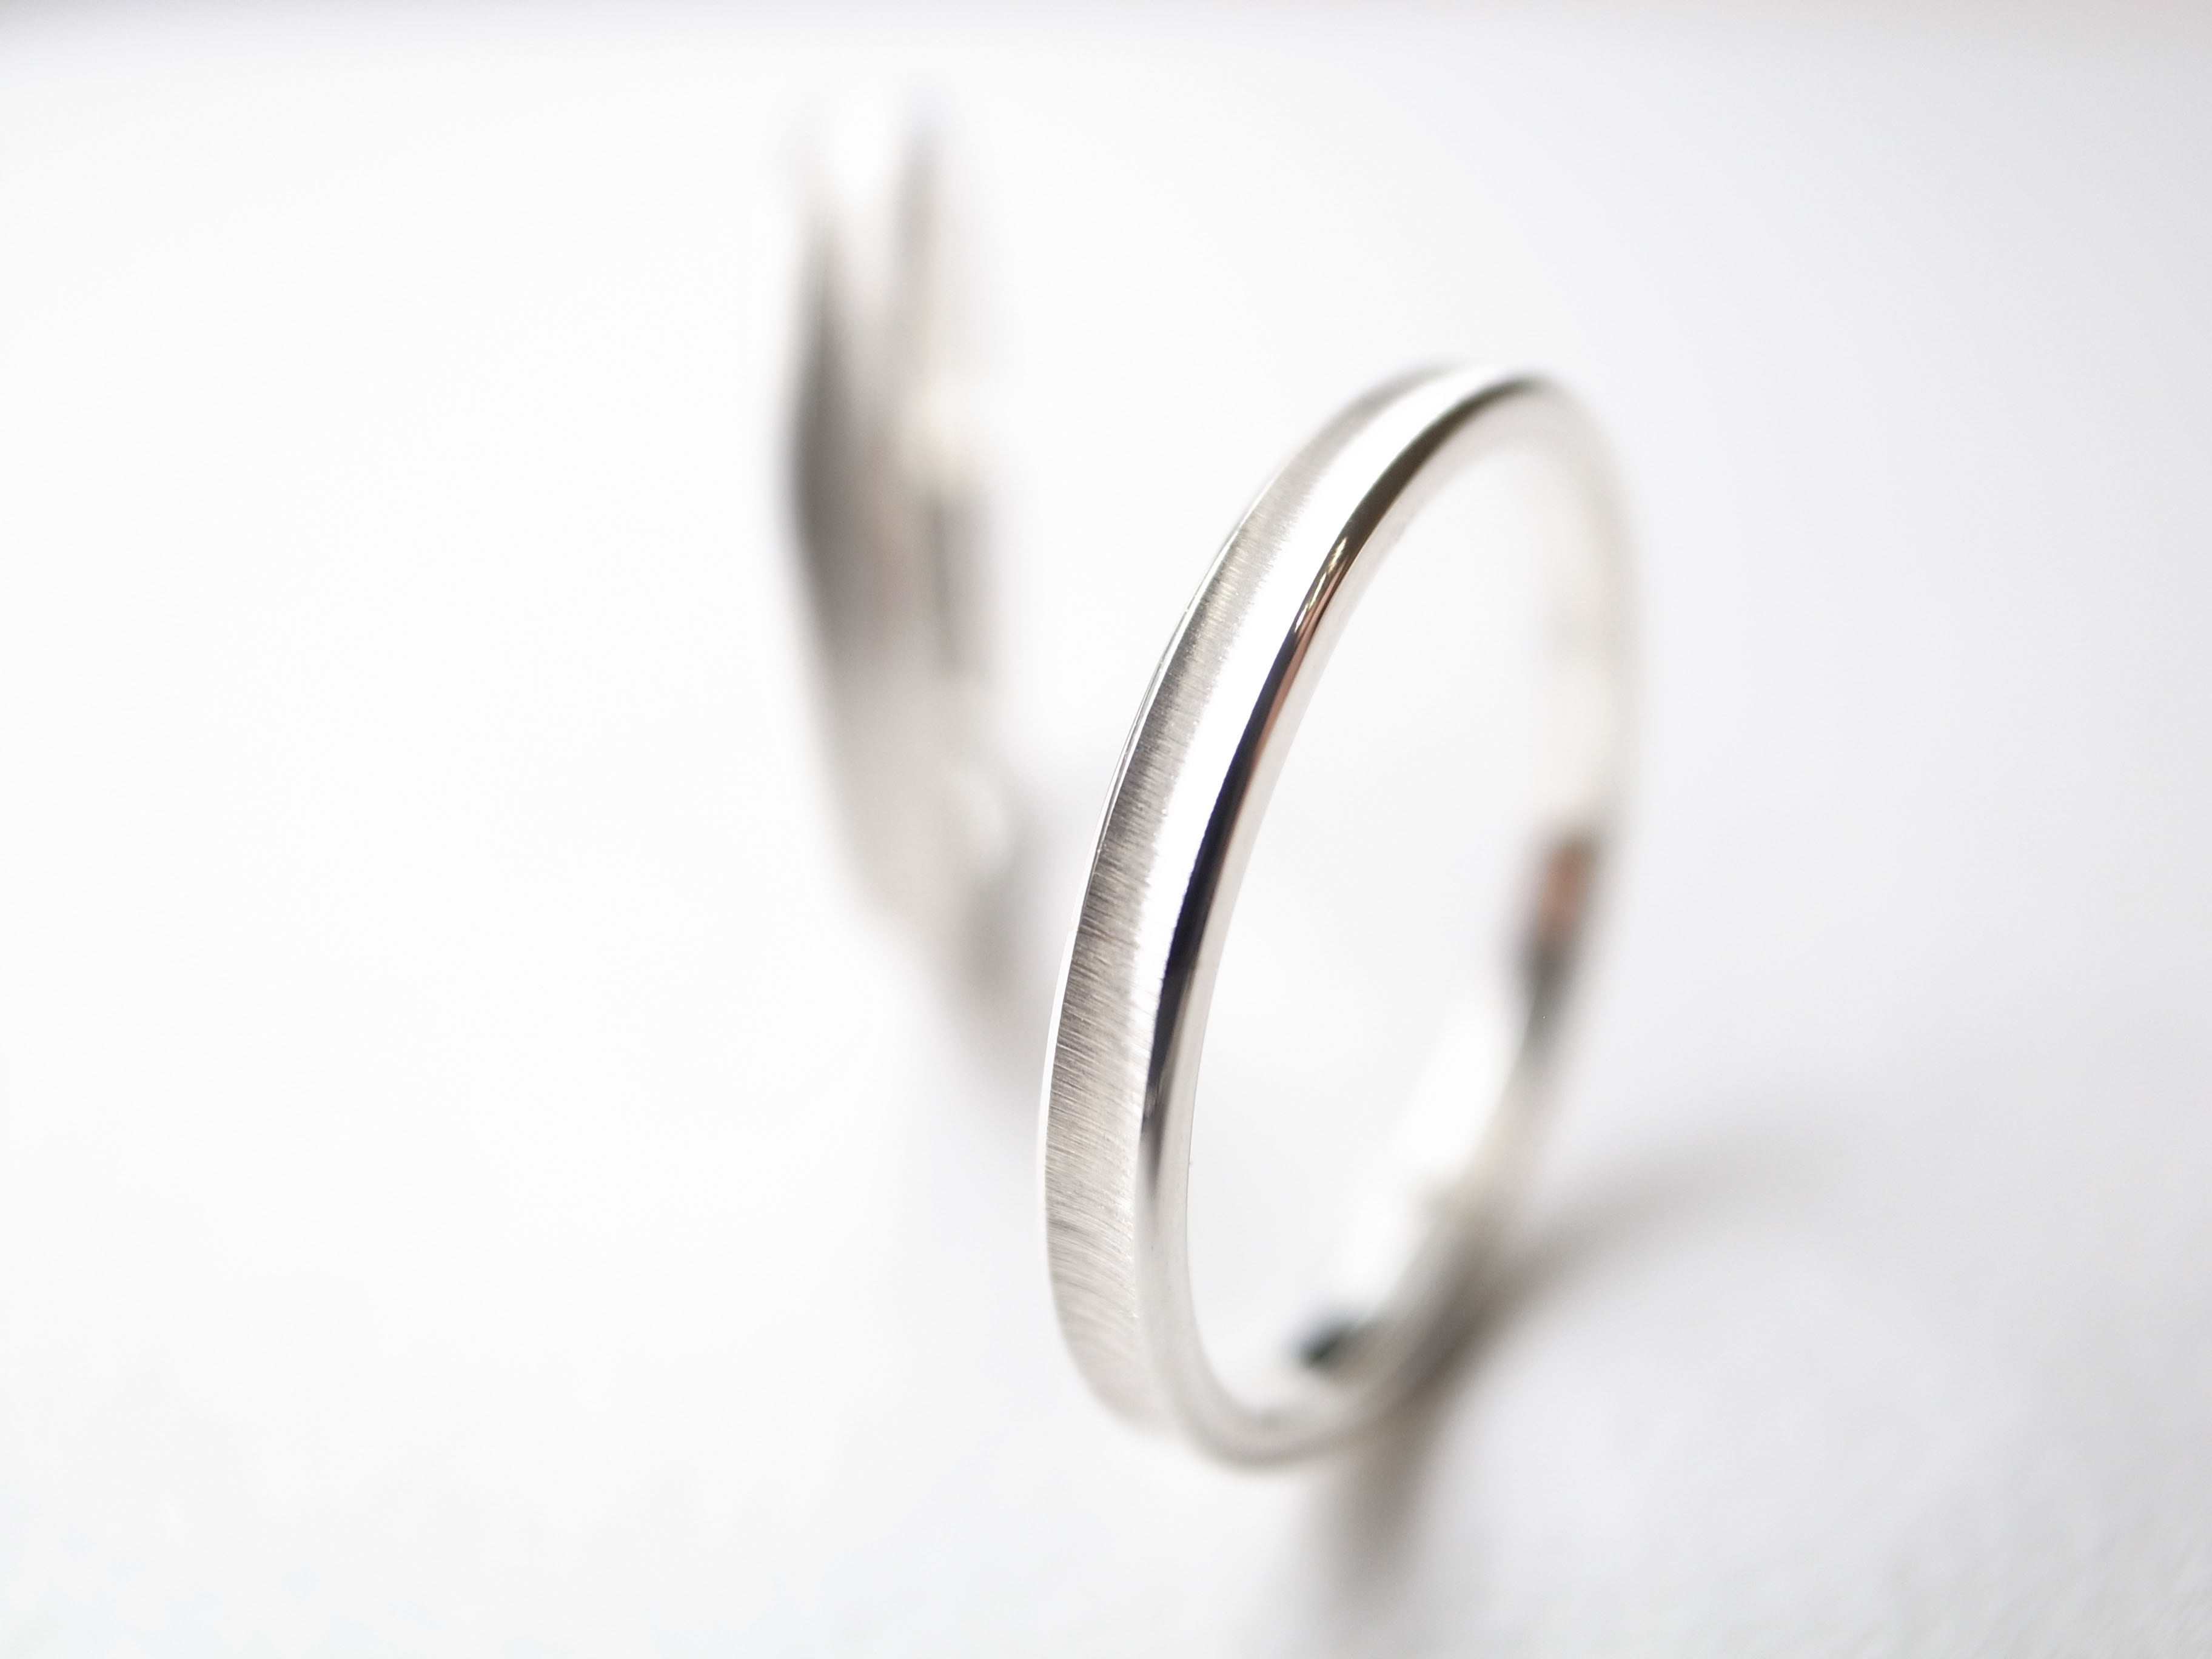 【pairing・stamp】Pt900/gloss ring